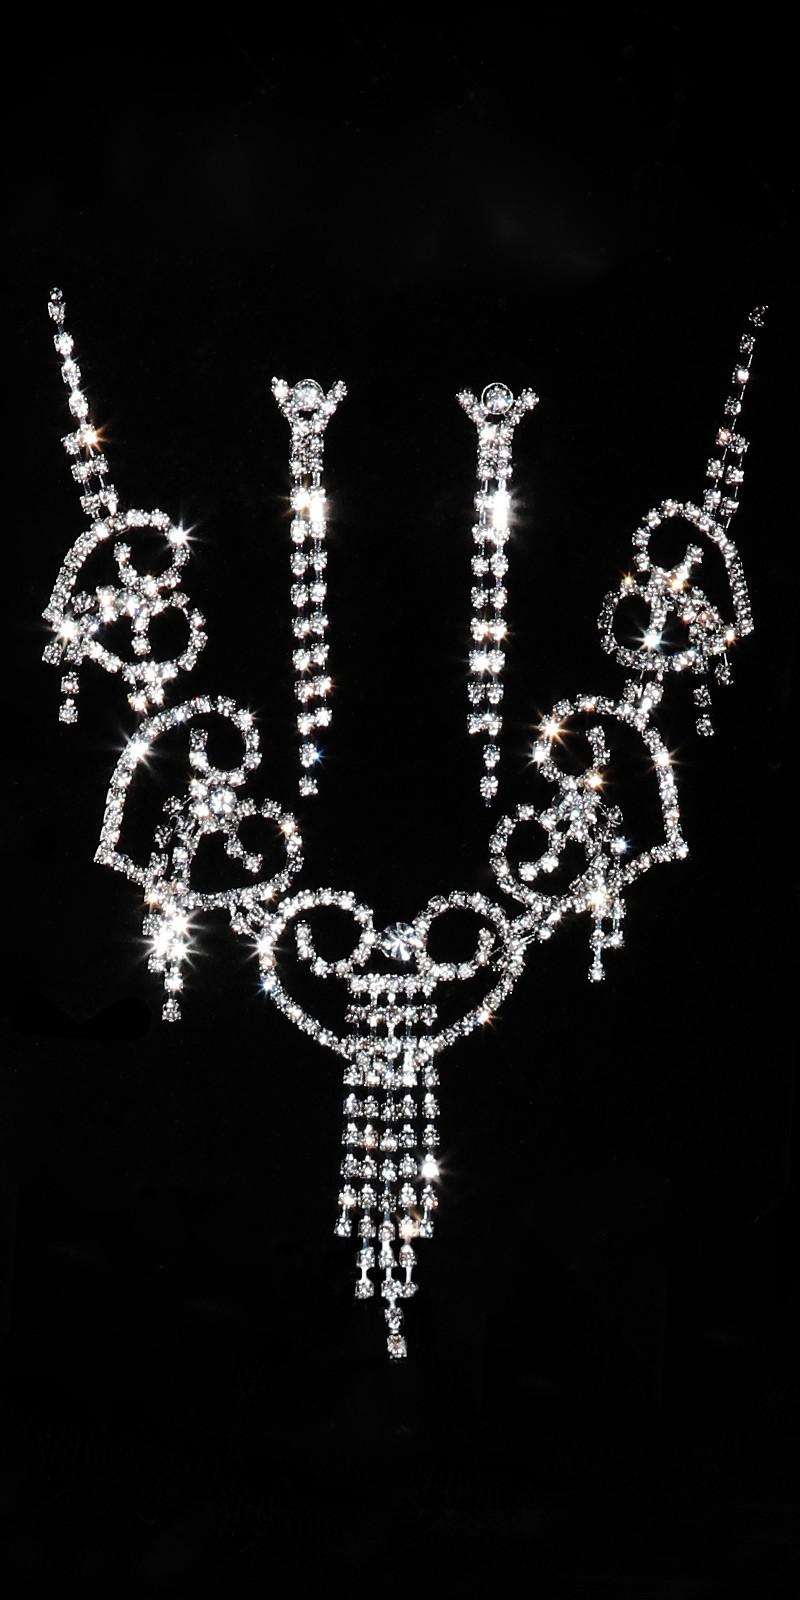 Shoppa strass set halsband   örhängen online  563d5f792ed03